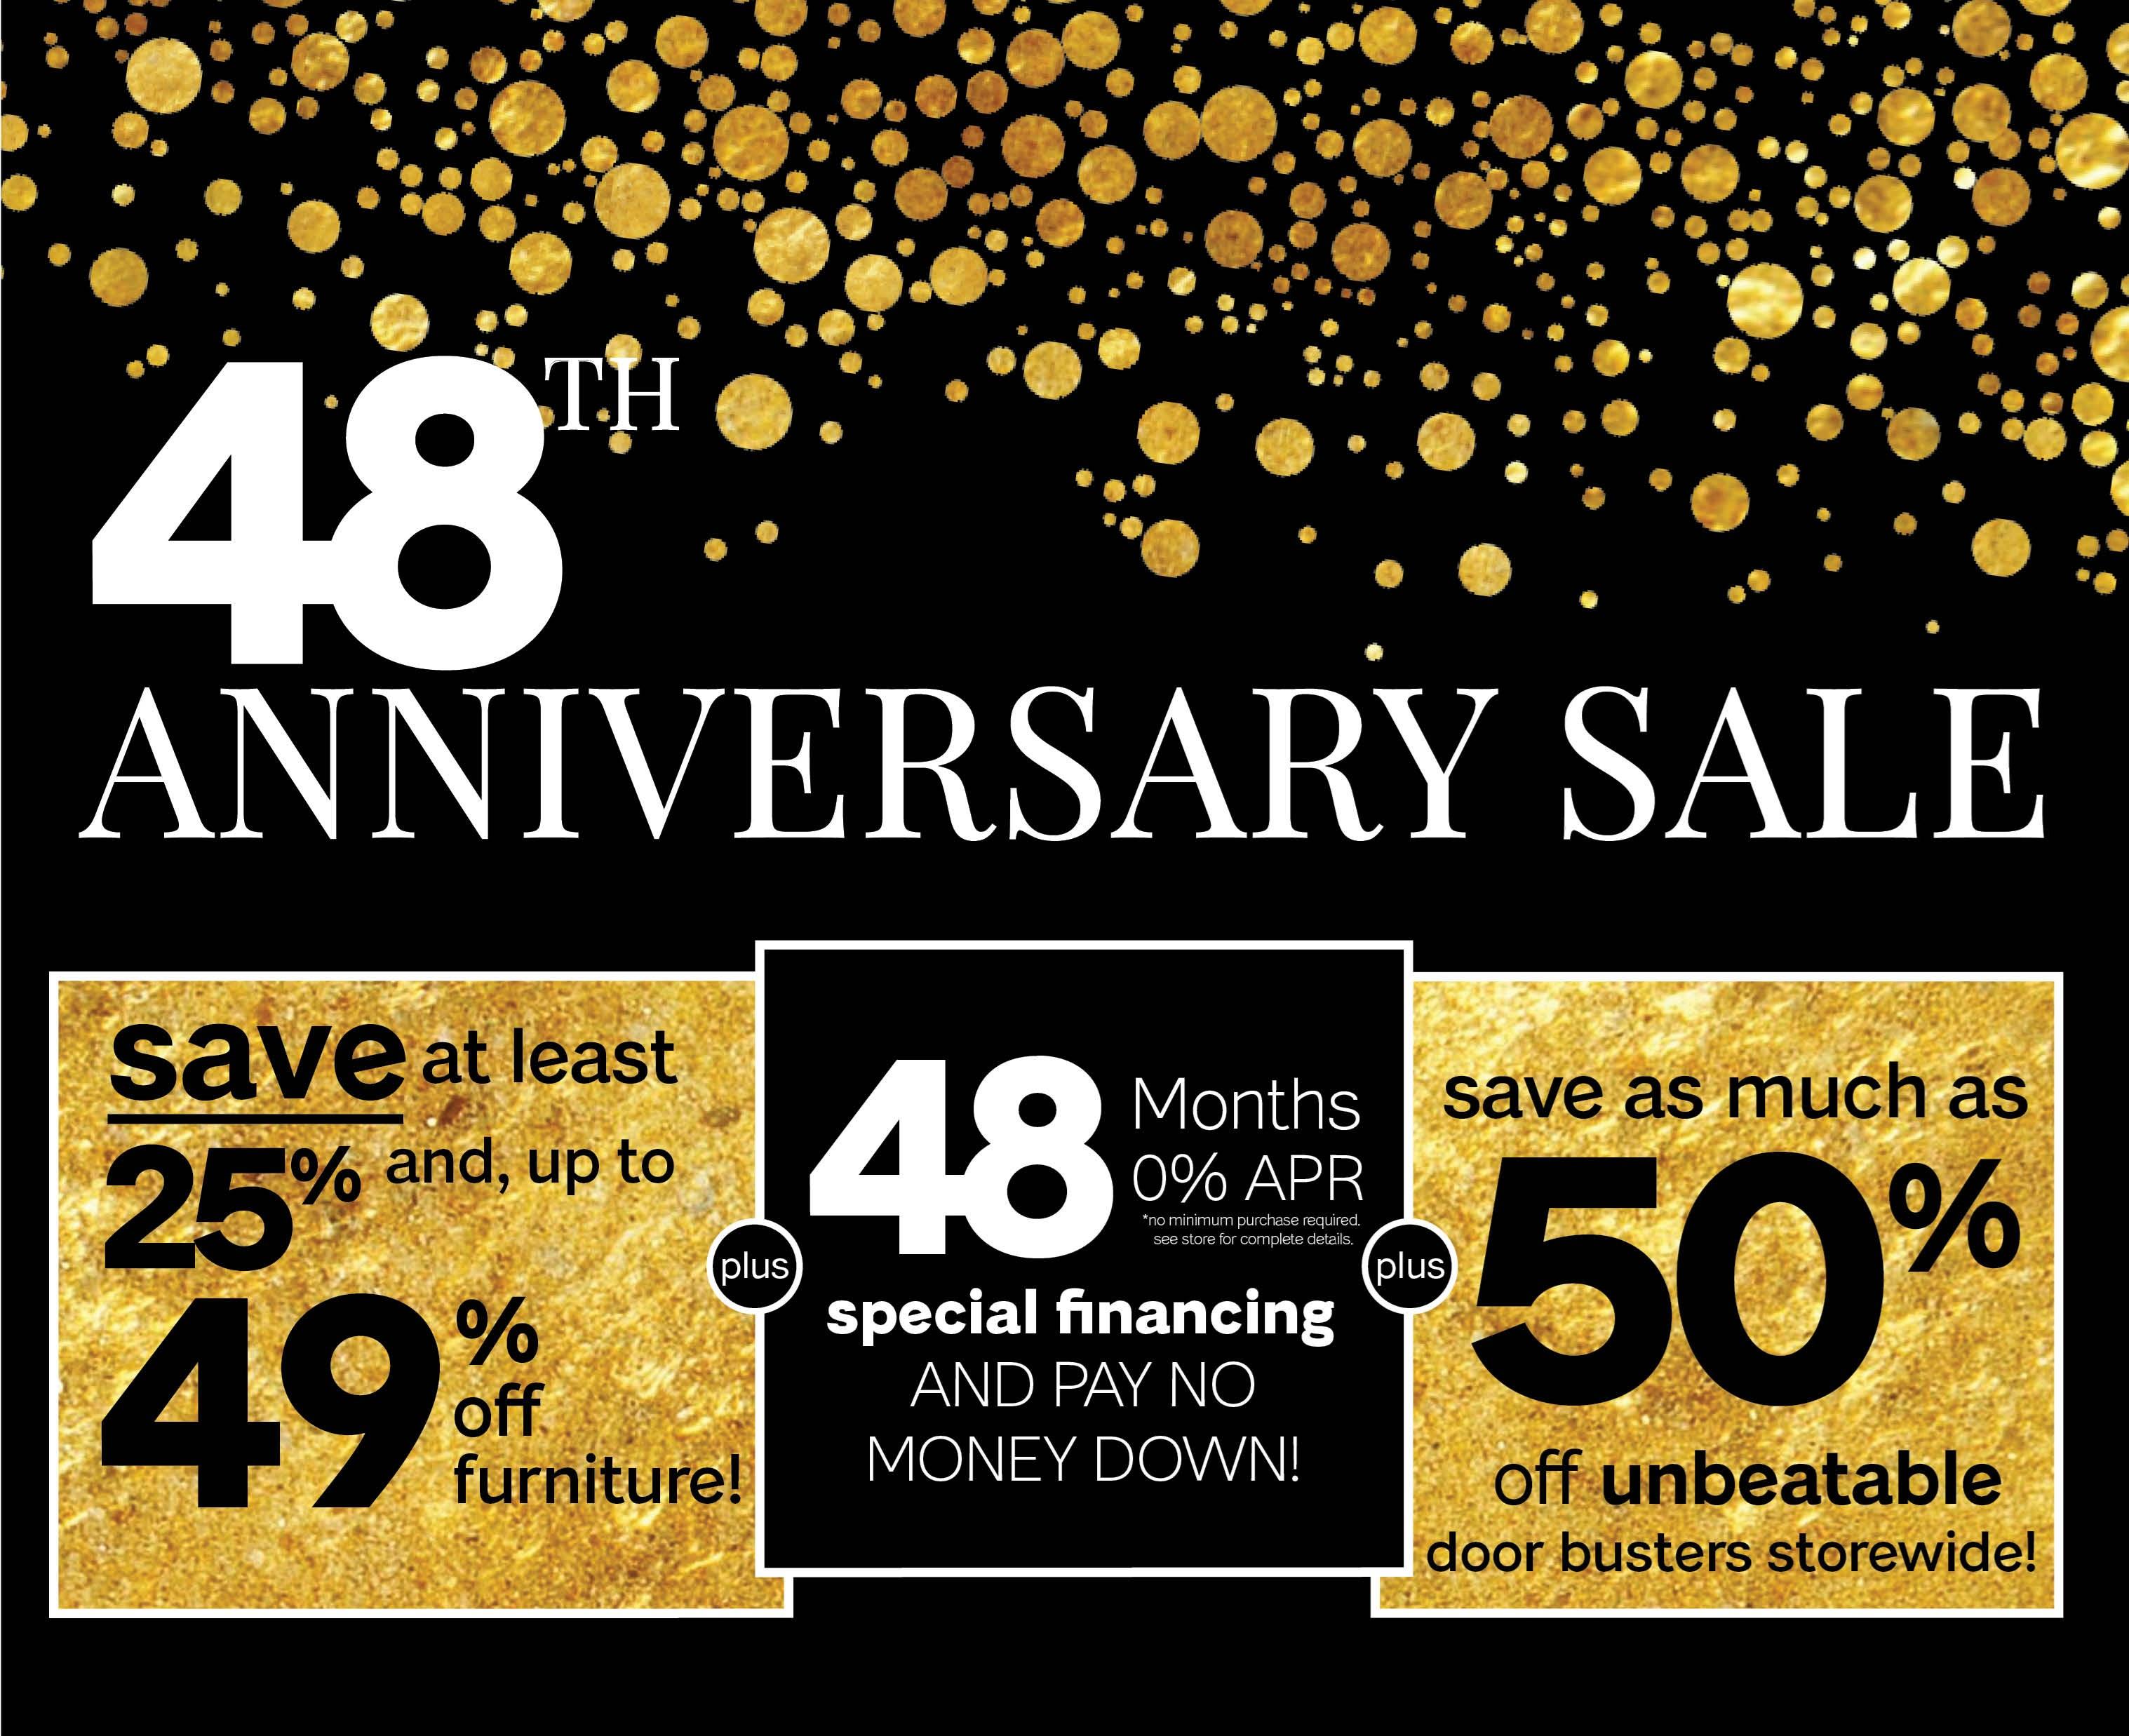 Furniture & ApplianceMart 48th Anniversary Sale